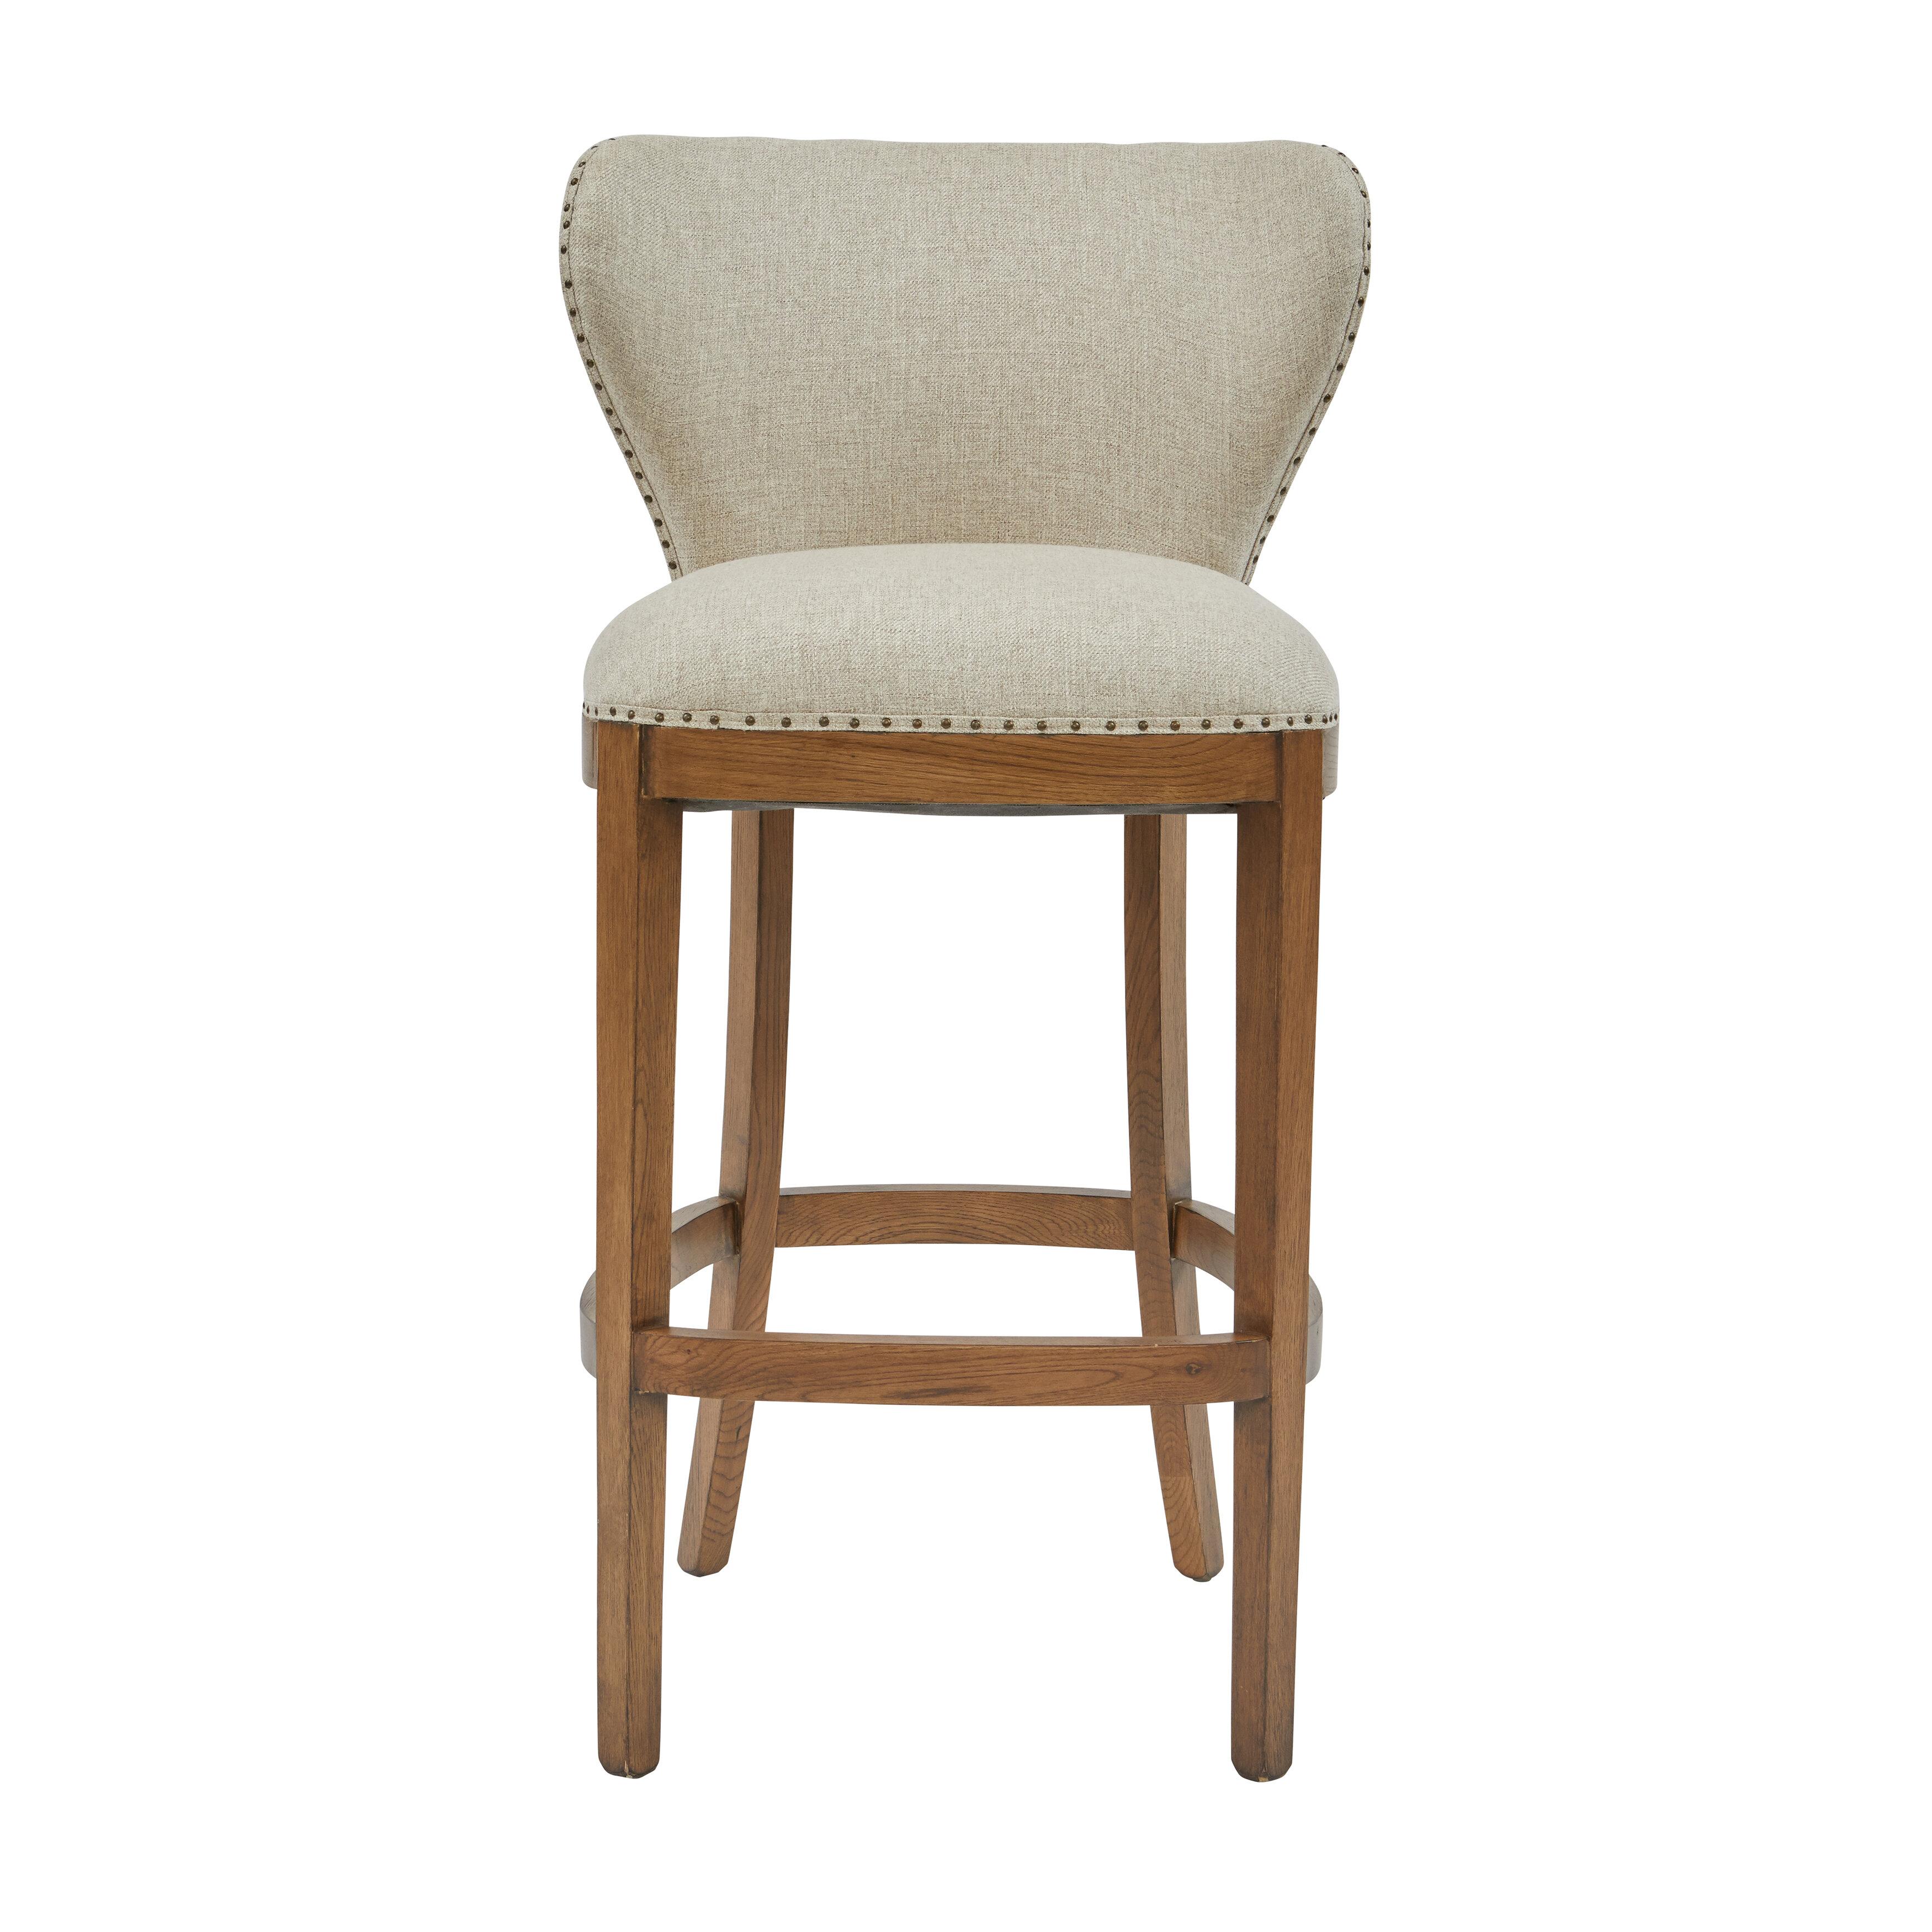 Remarkable Kianna Bar Stool Beatyapartments Chair Design Images Beatyapartmentscom